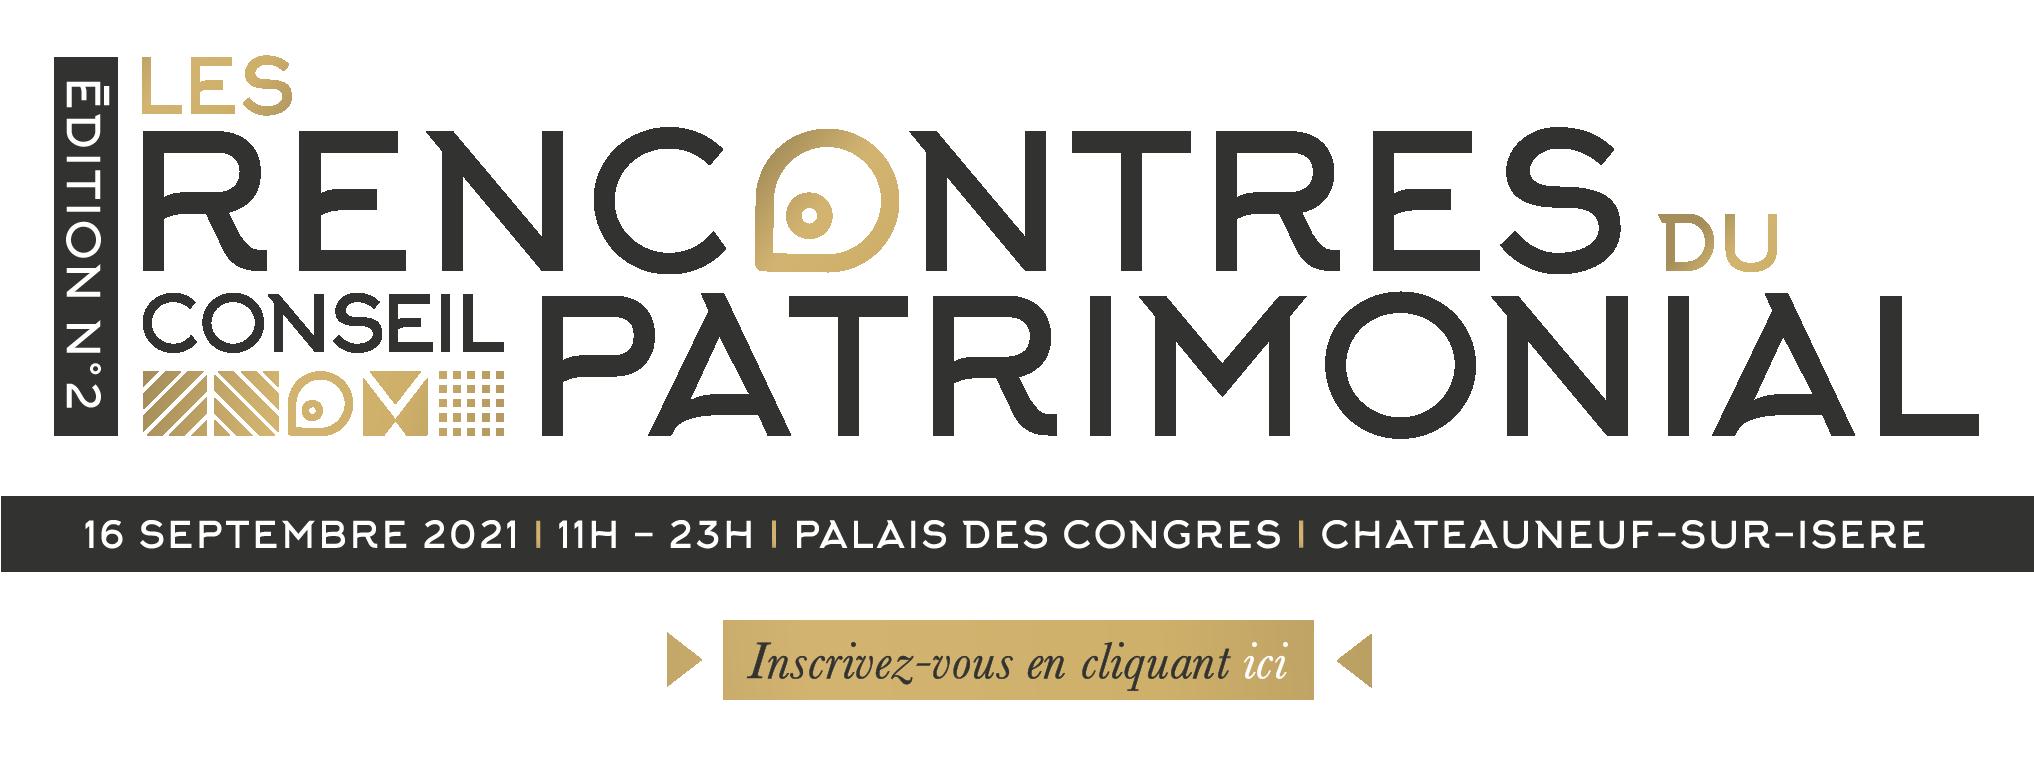 Invitation rencontres du conseil patrimonial